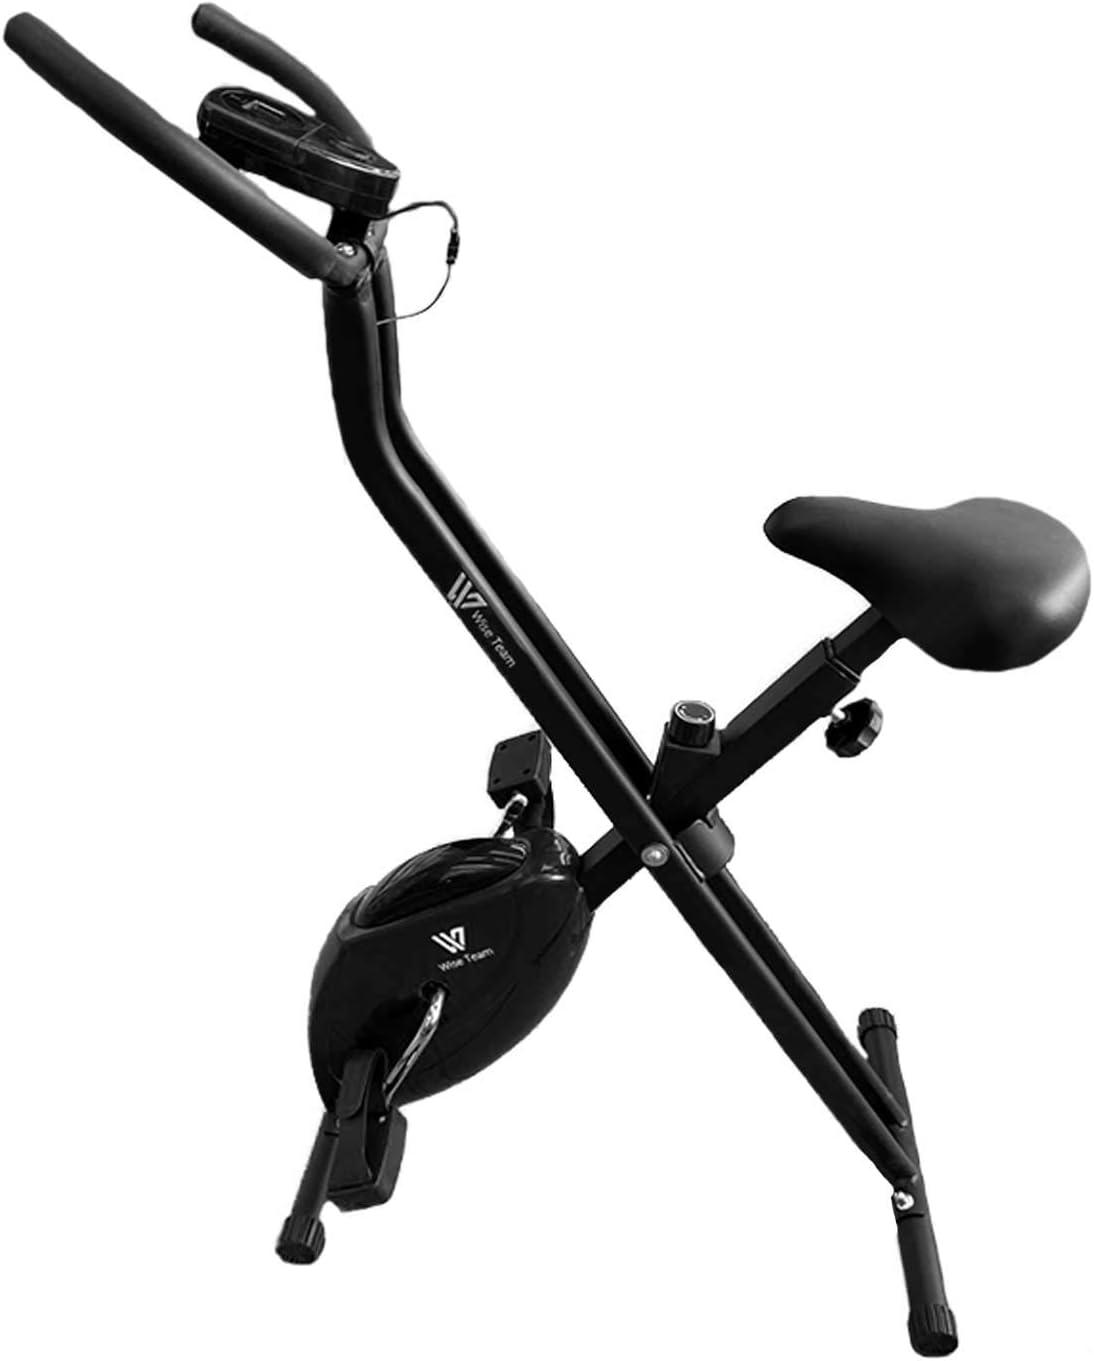 HANKING PLANET Bicicleta estática Plegable, Bicicleta estática Fitness con Niveles de Resistencia, Pantalla info. Velocidad, Distancia, calorias.